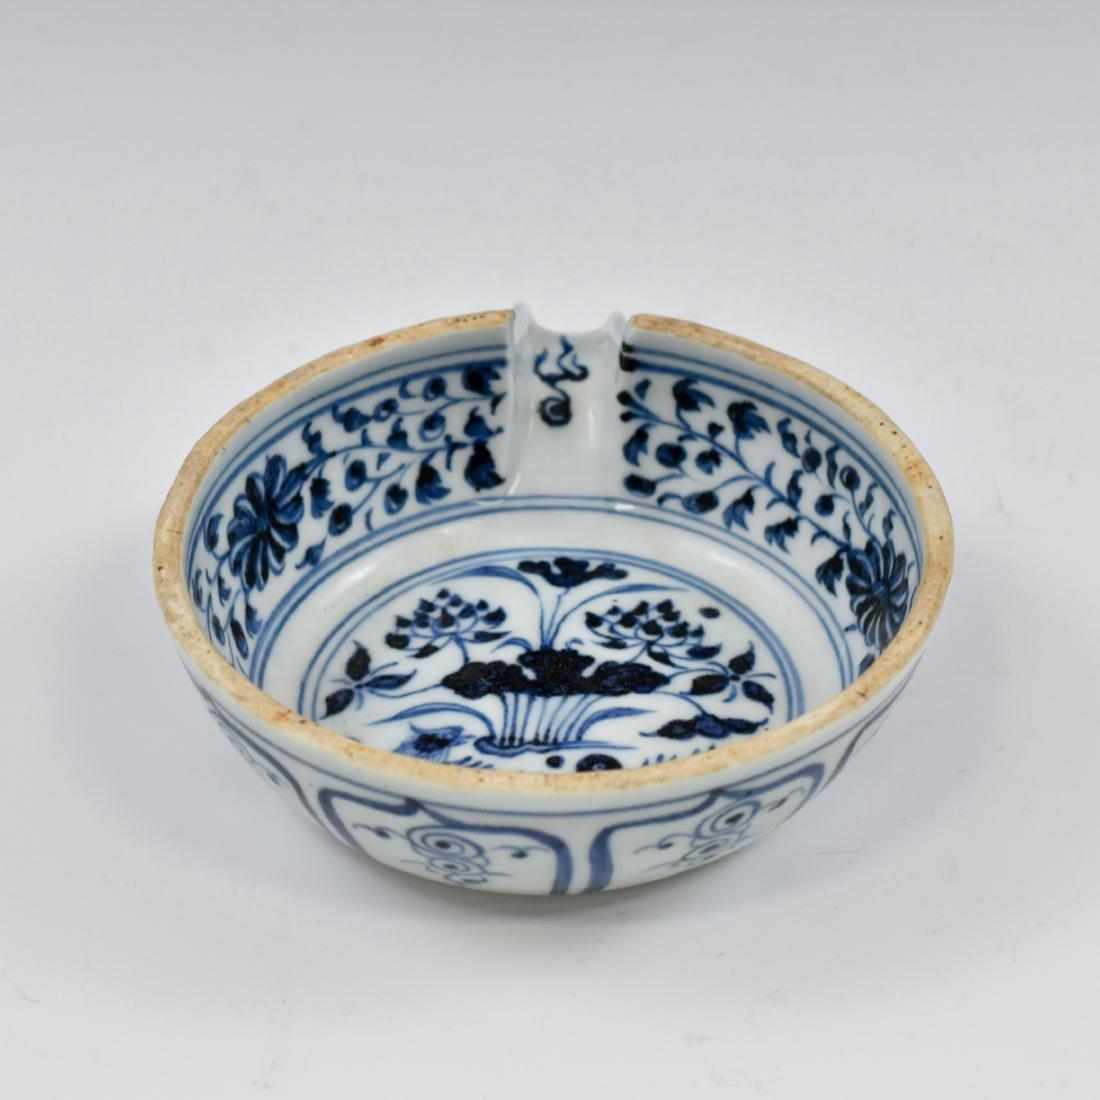 15 TH C YUAN DYNASTY BLUE & WHITE PORCELAIN WATER - 9